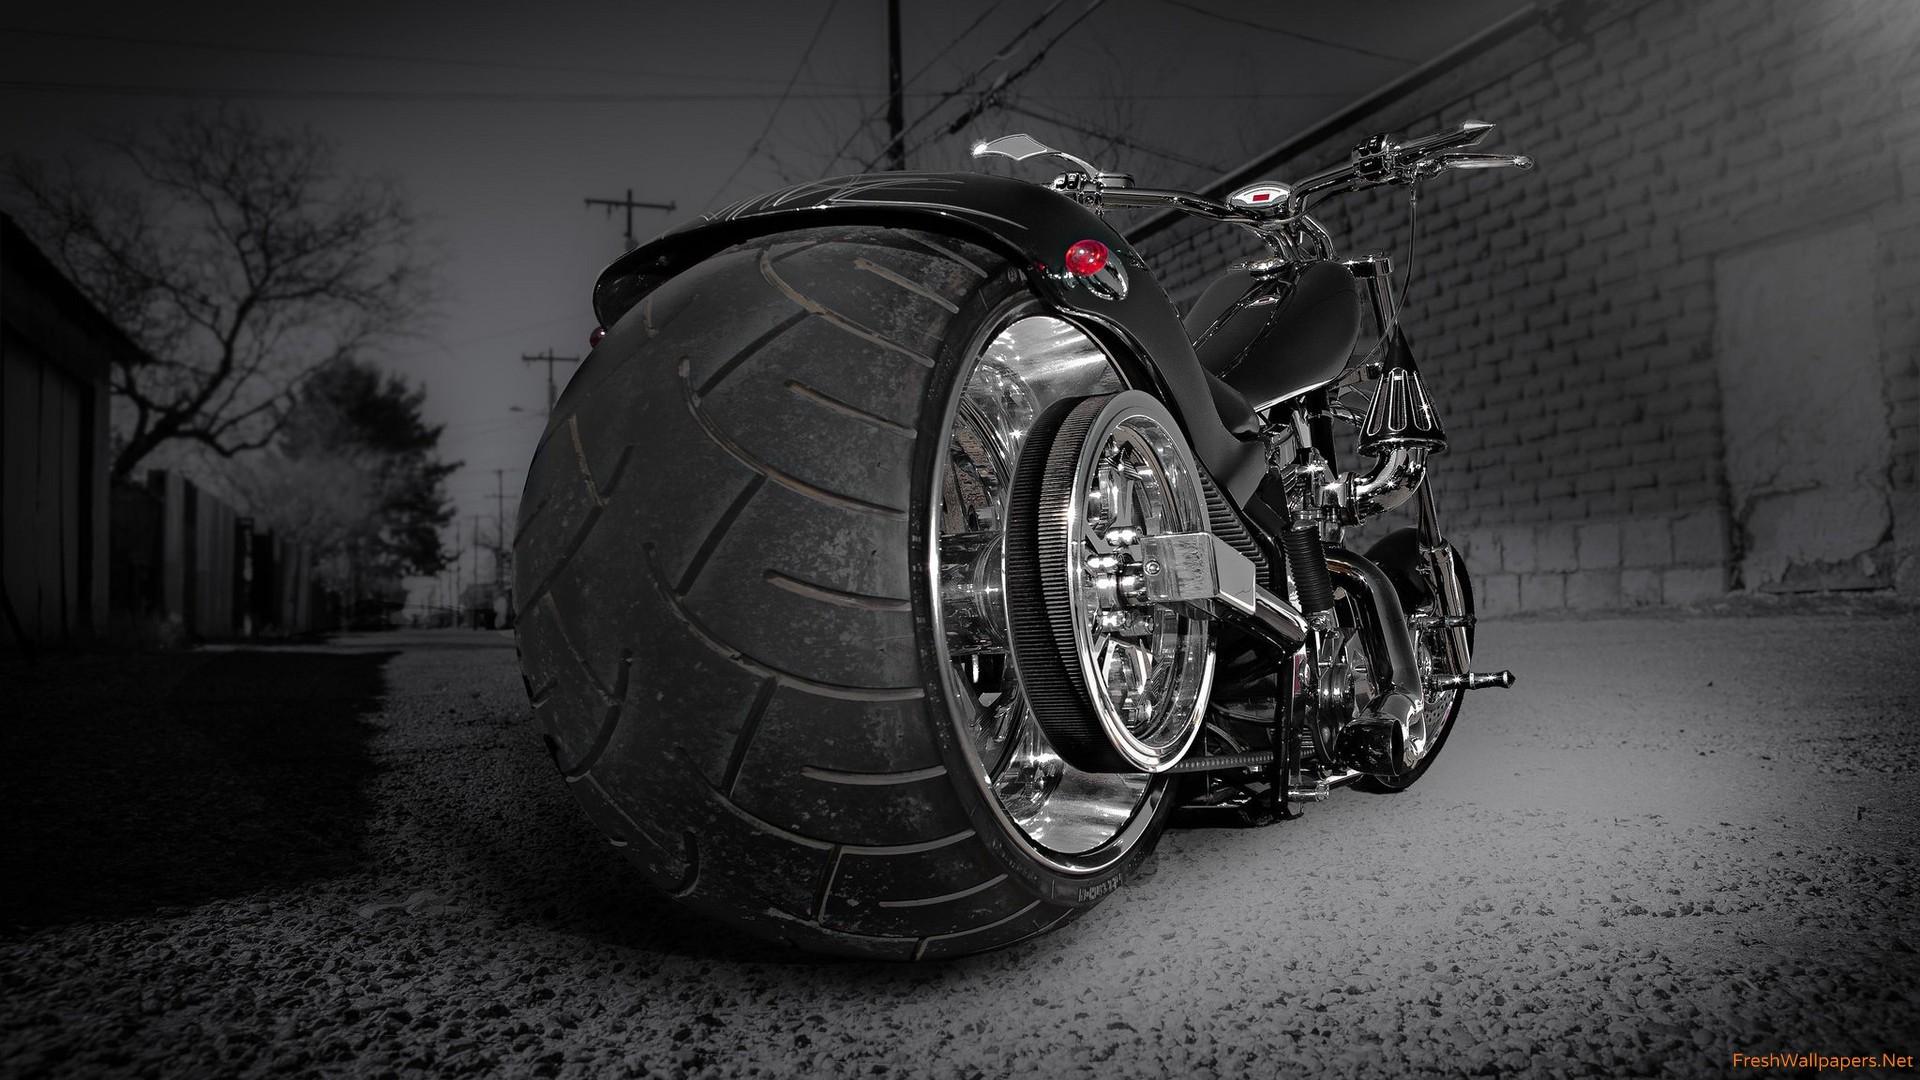 Cute Rat Wallpaper Hd 1366x768 Custom Chooper Wide Tyre Hd Bikes 4k Wallpapers Images